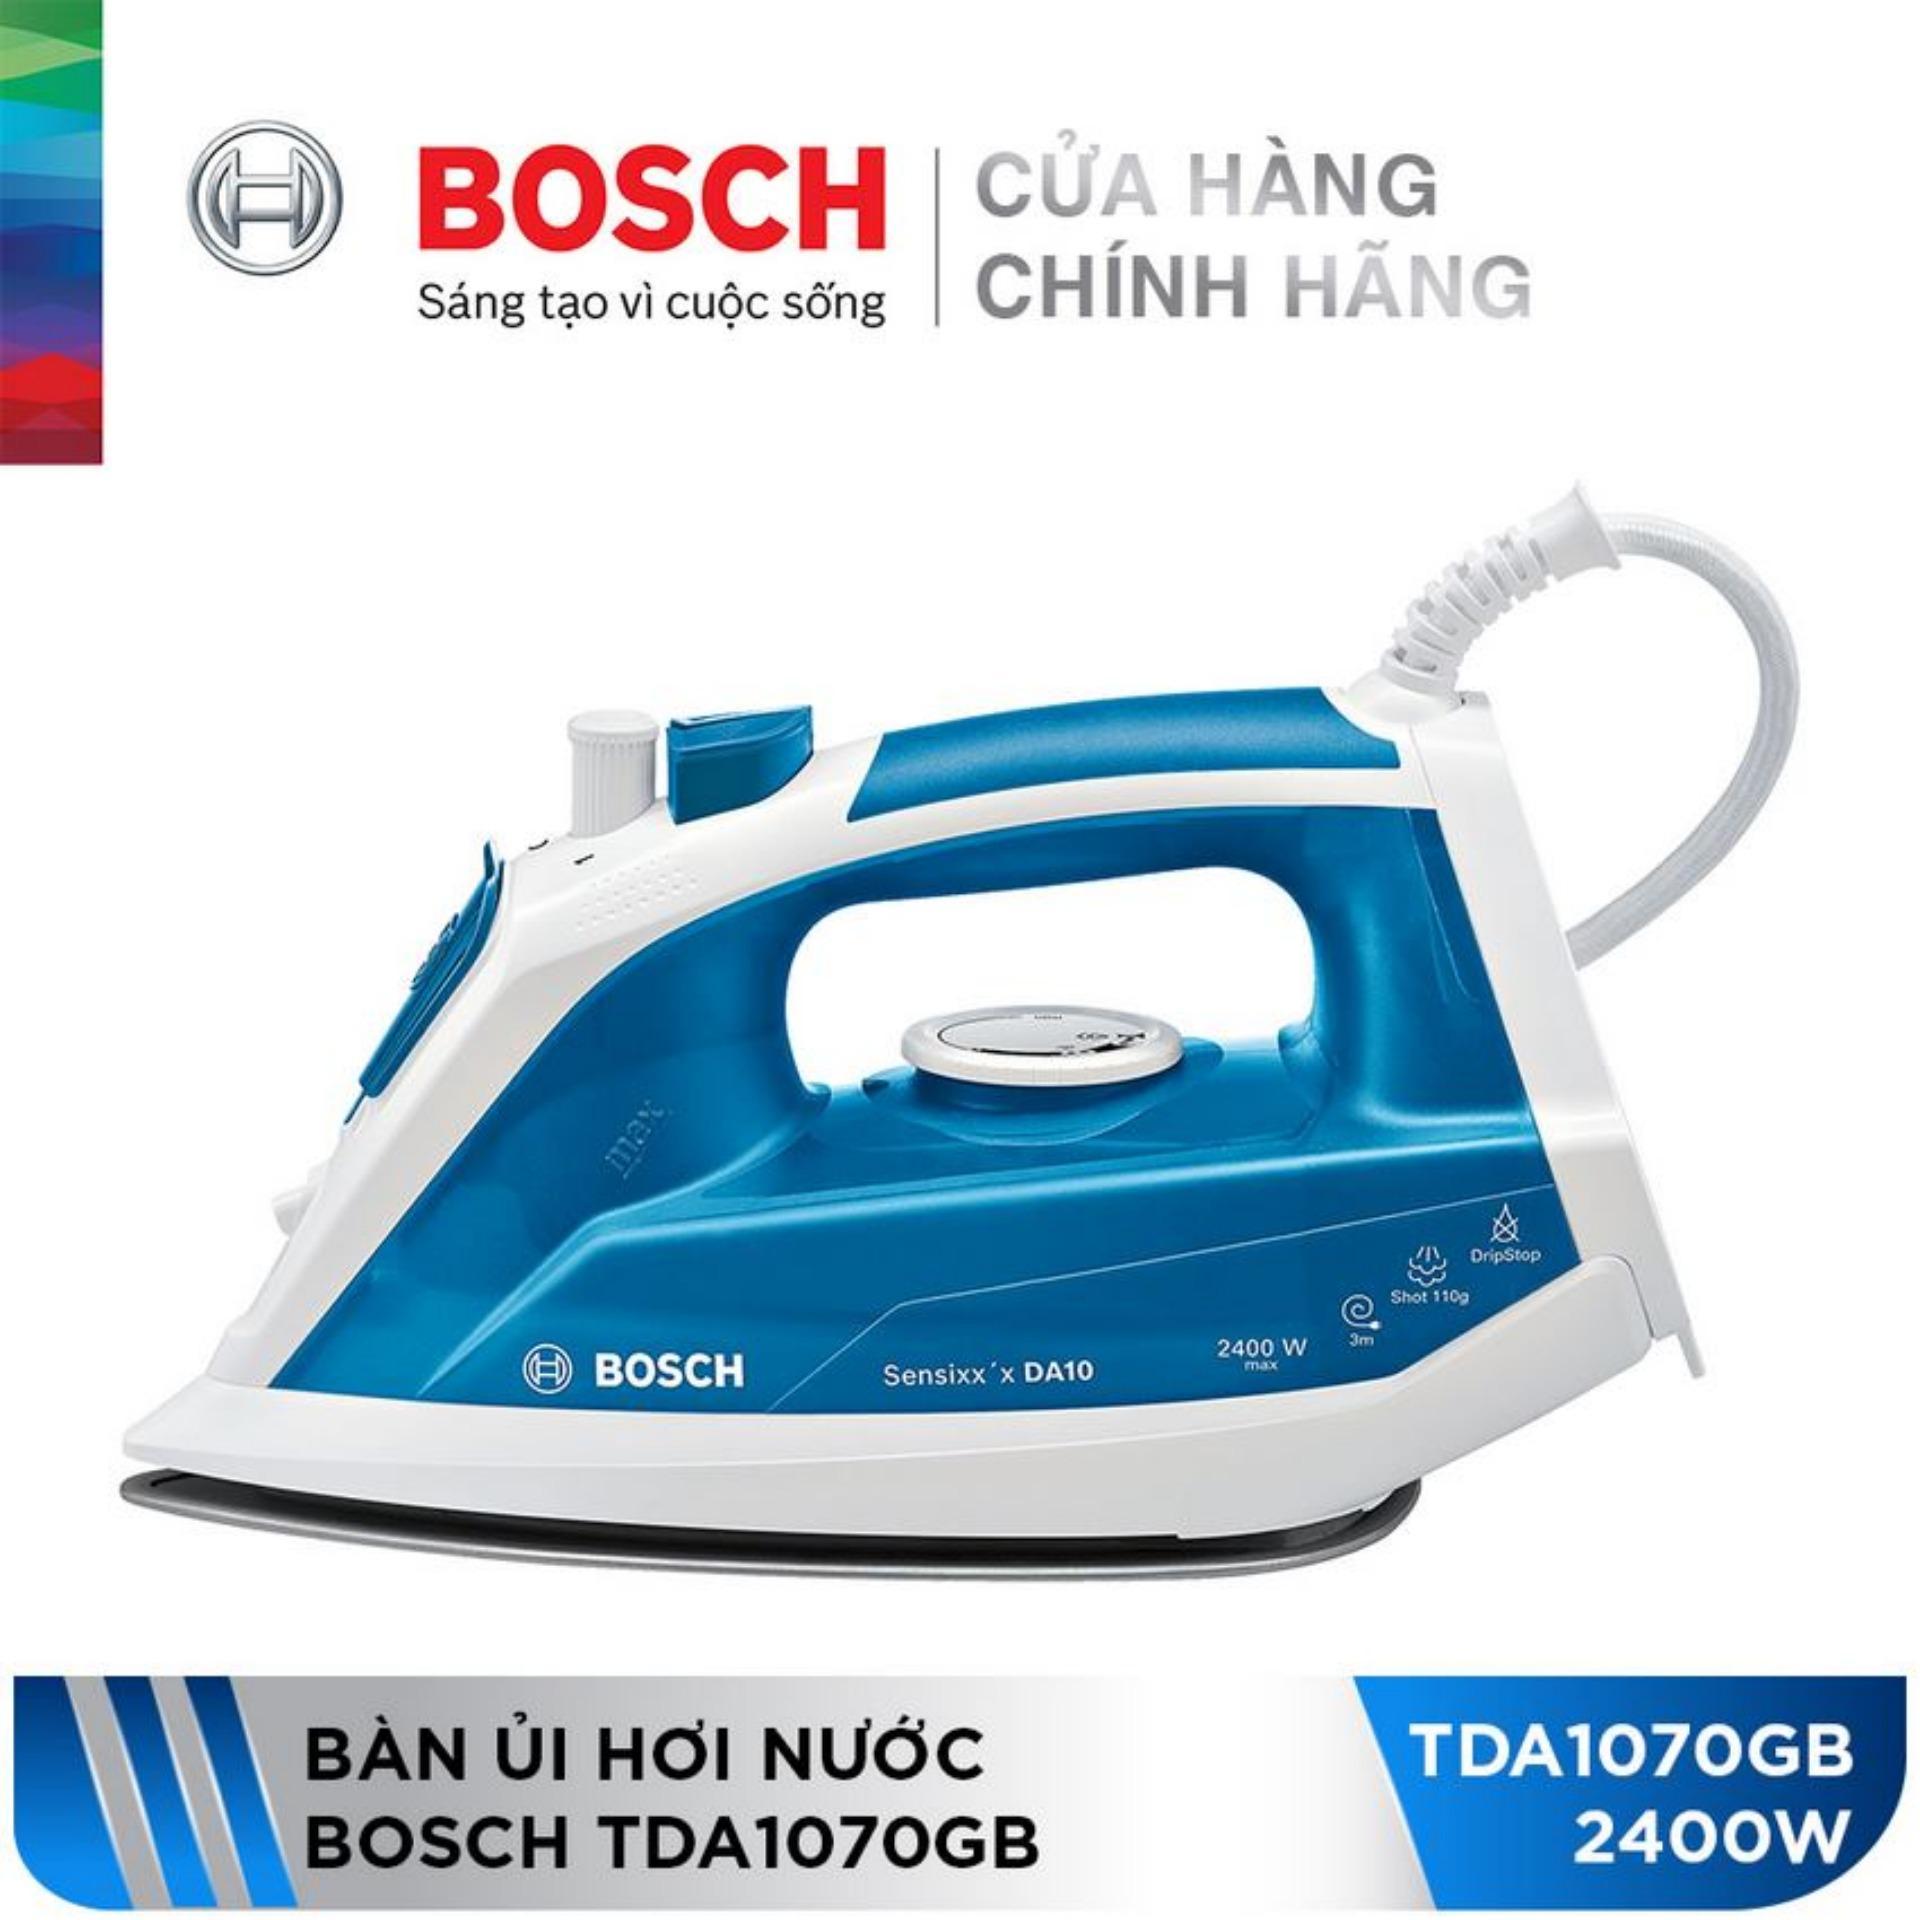 Bàn ủi hơi nước Bosch TDA1070GB (2400W)